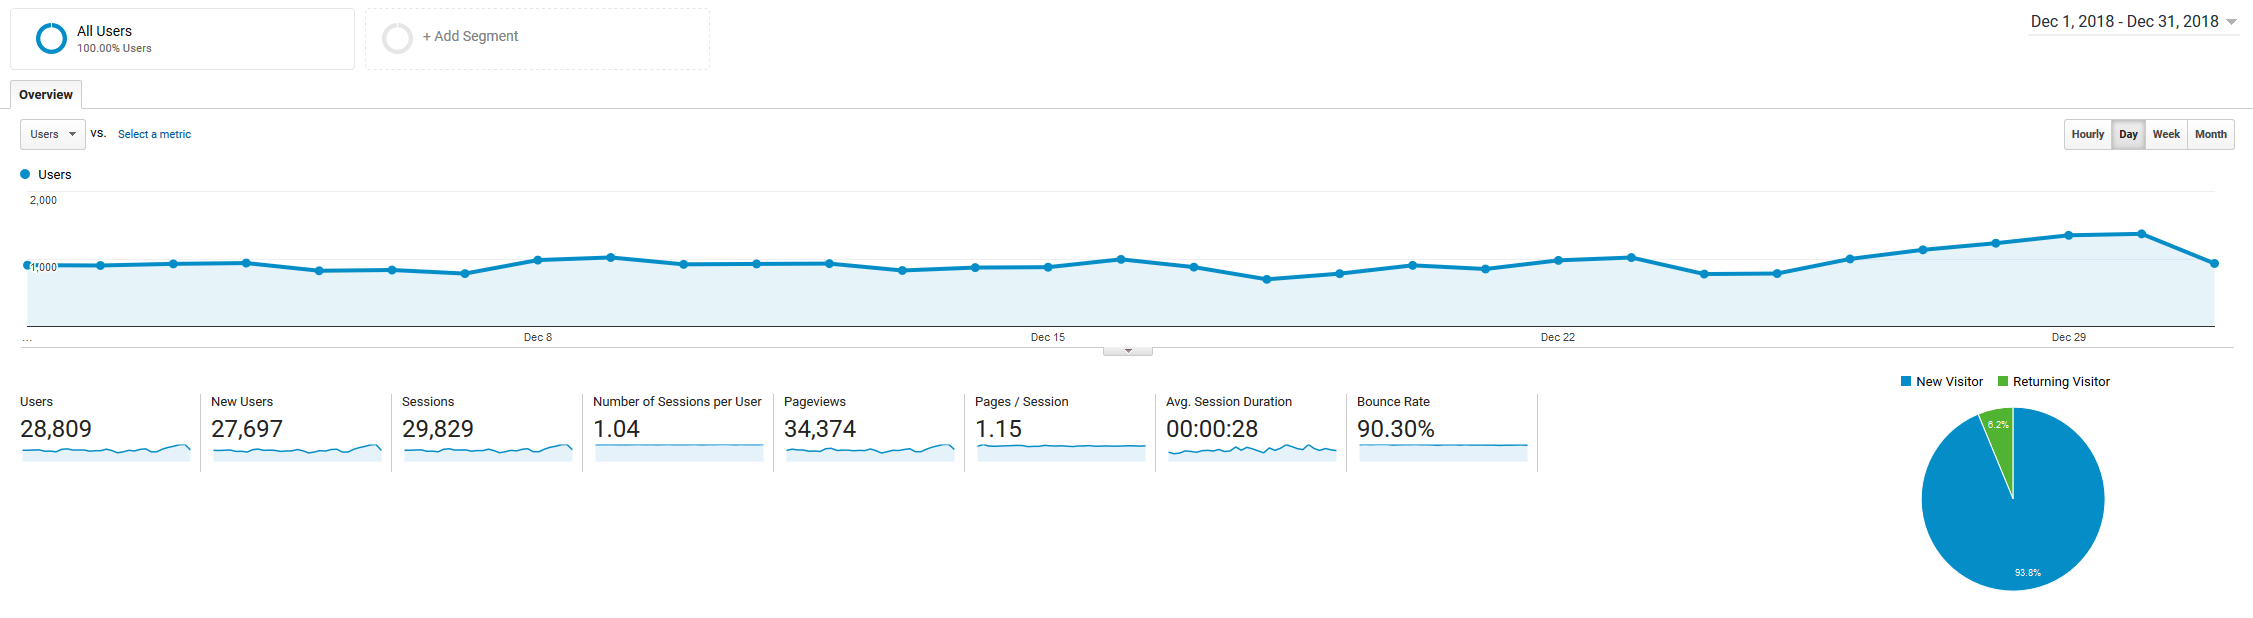 December 2018 Google Analytics roseclearfield.com | https://www.roseclearfield.com